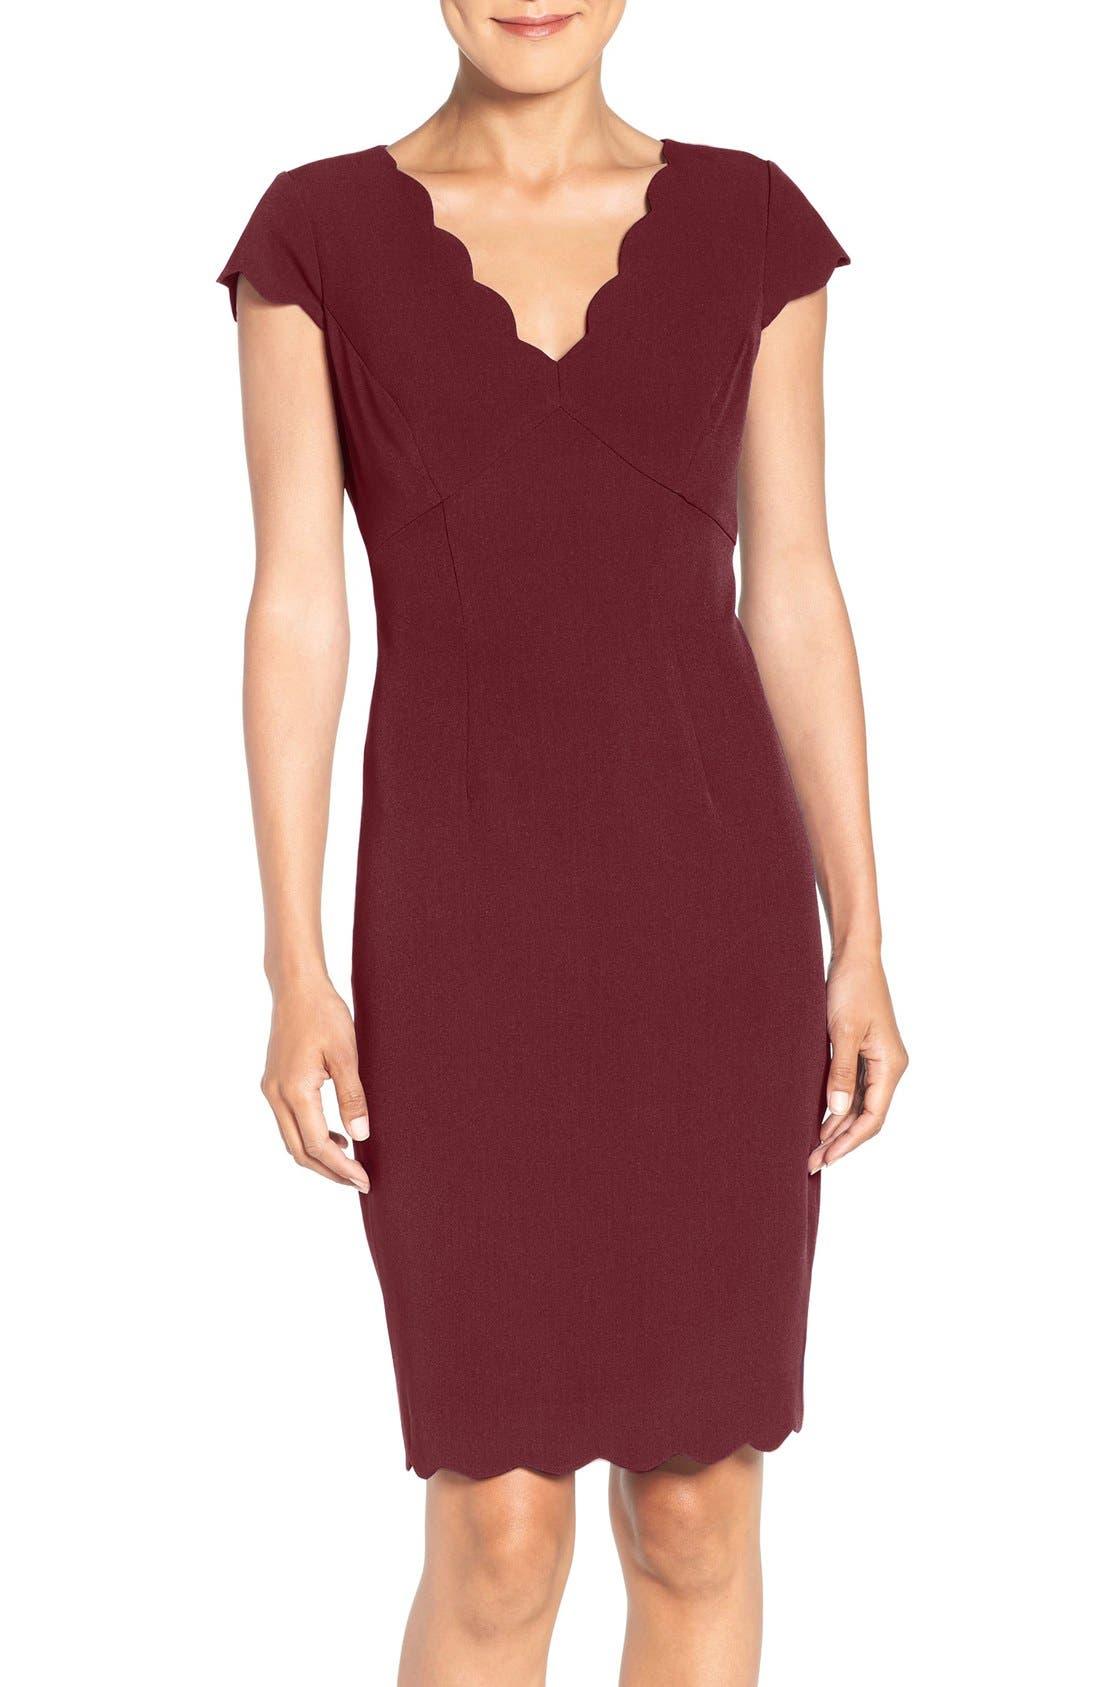 Main Image - Adrianna Papell Scalloped Crepe Sheath Dress (Regular & Petite)